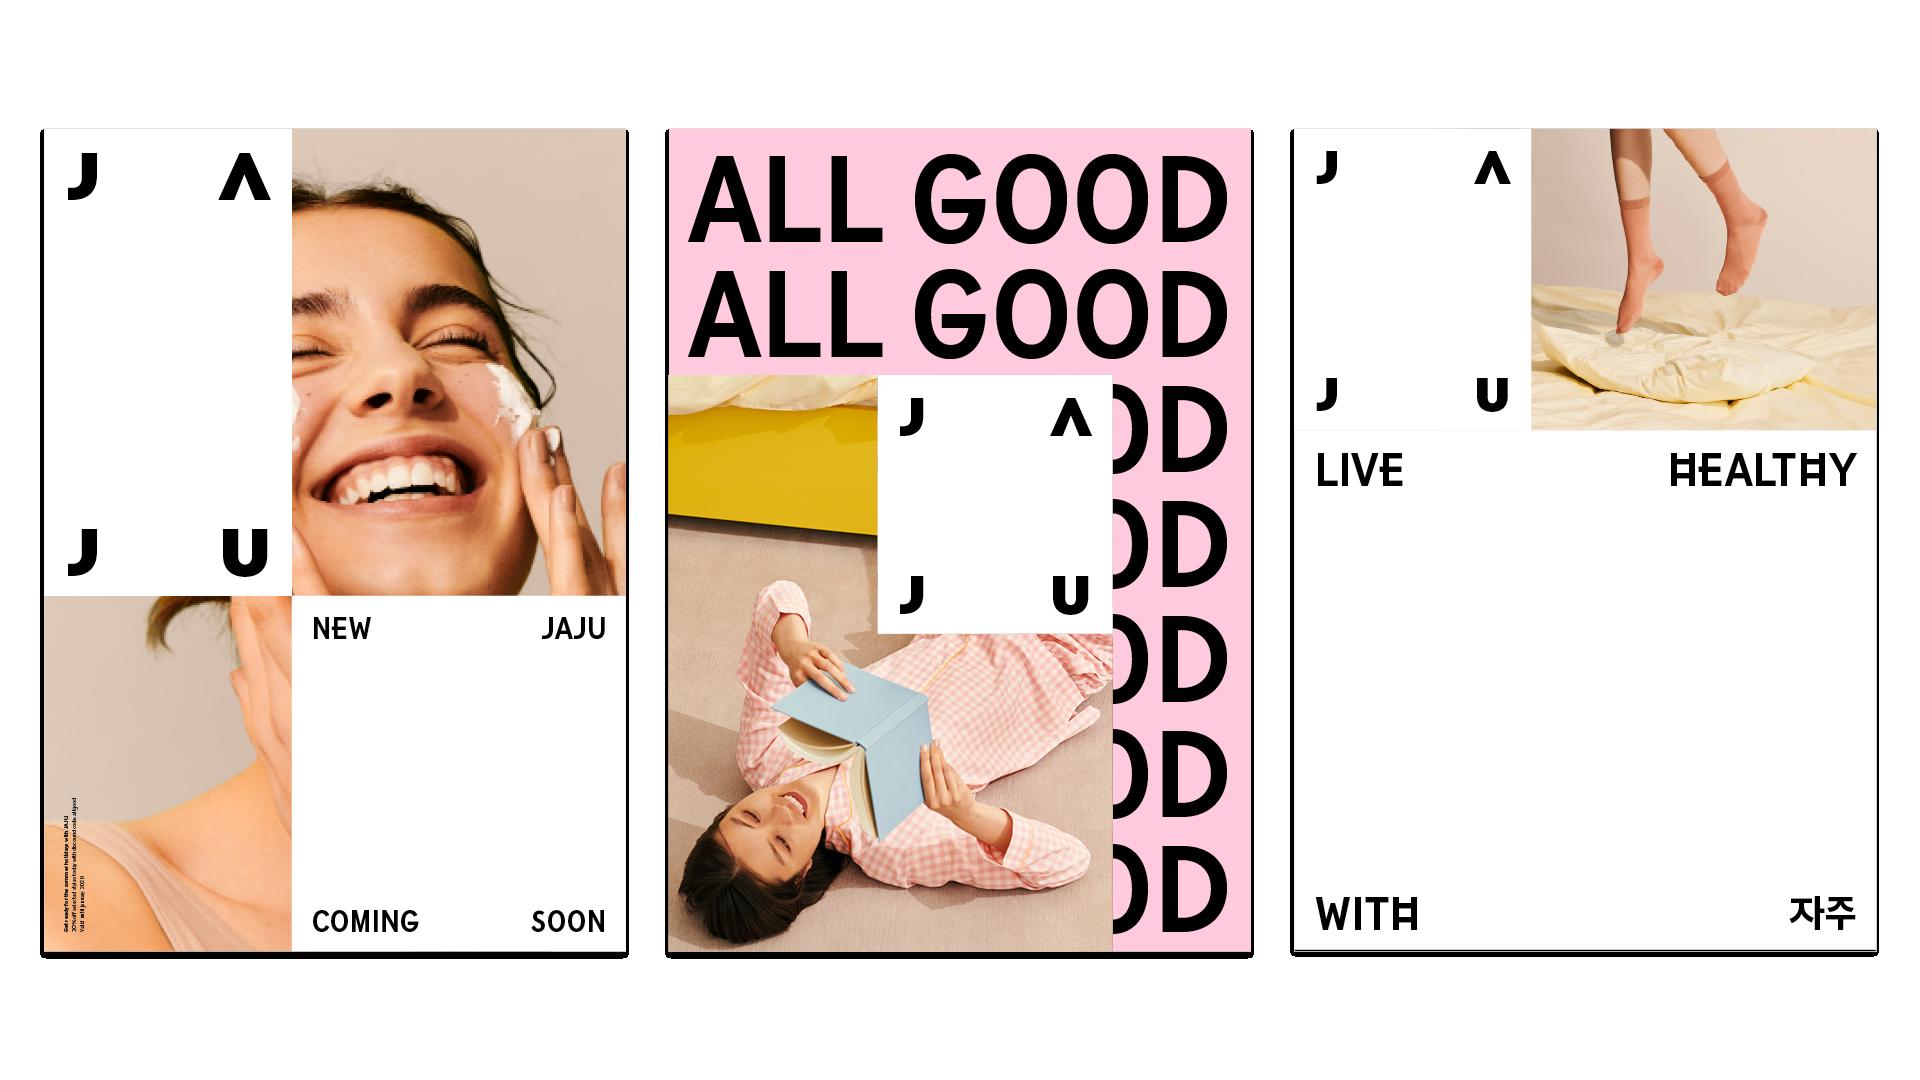 JAJU_web_v2_posters_2